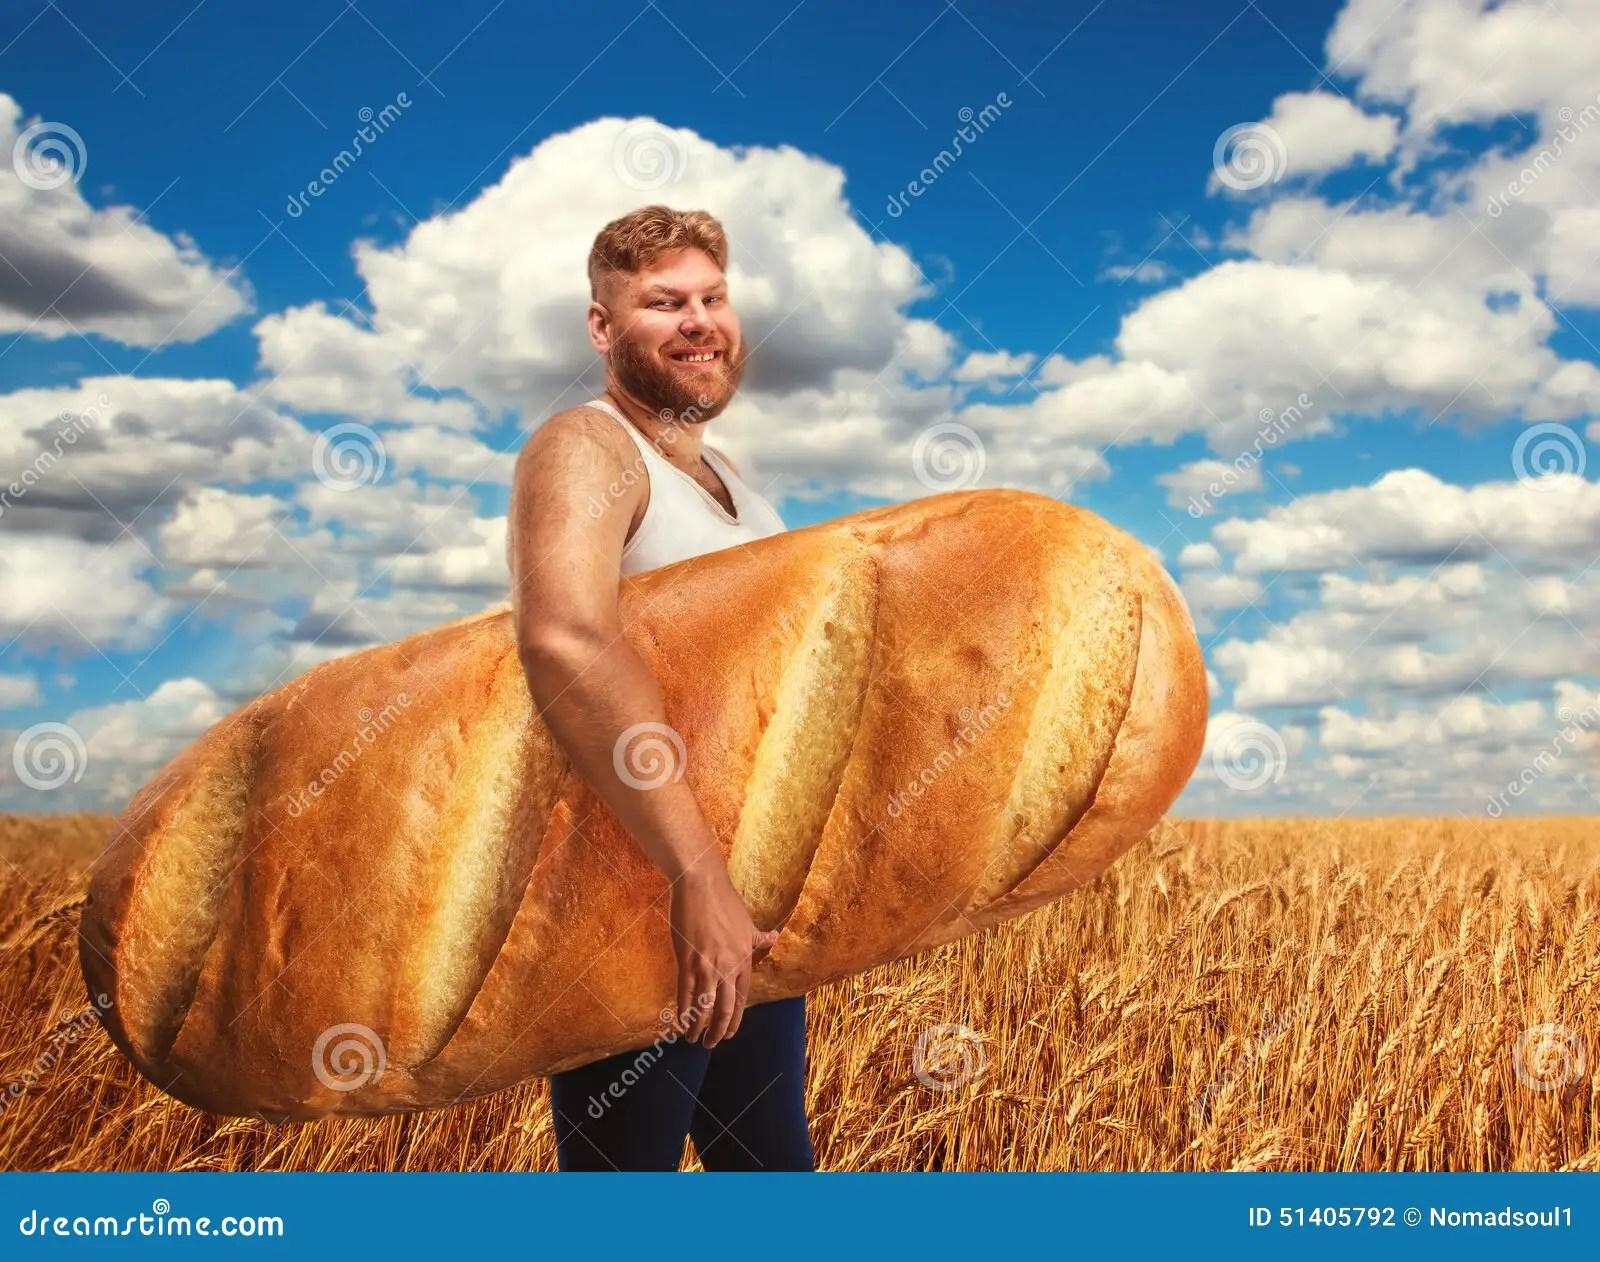 Pan X 3 X Loaf 5 12 2 5